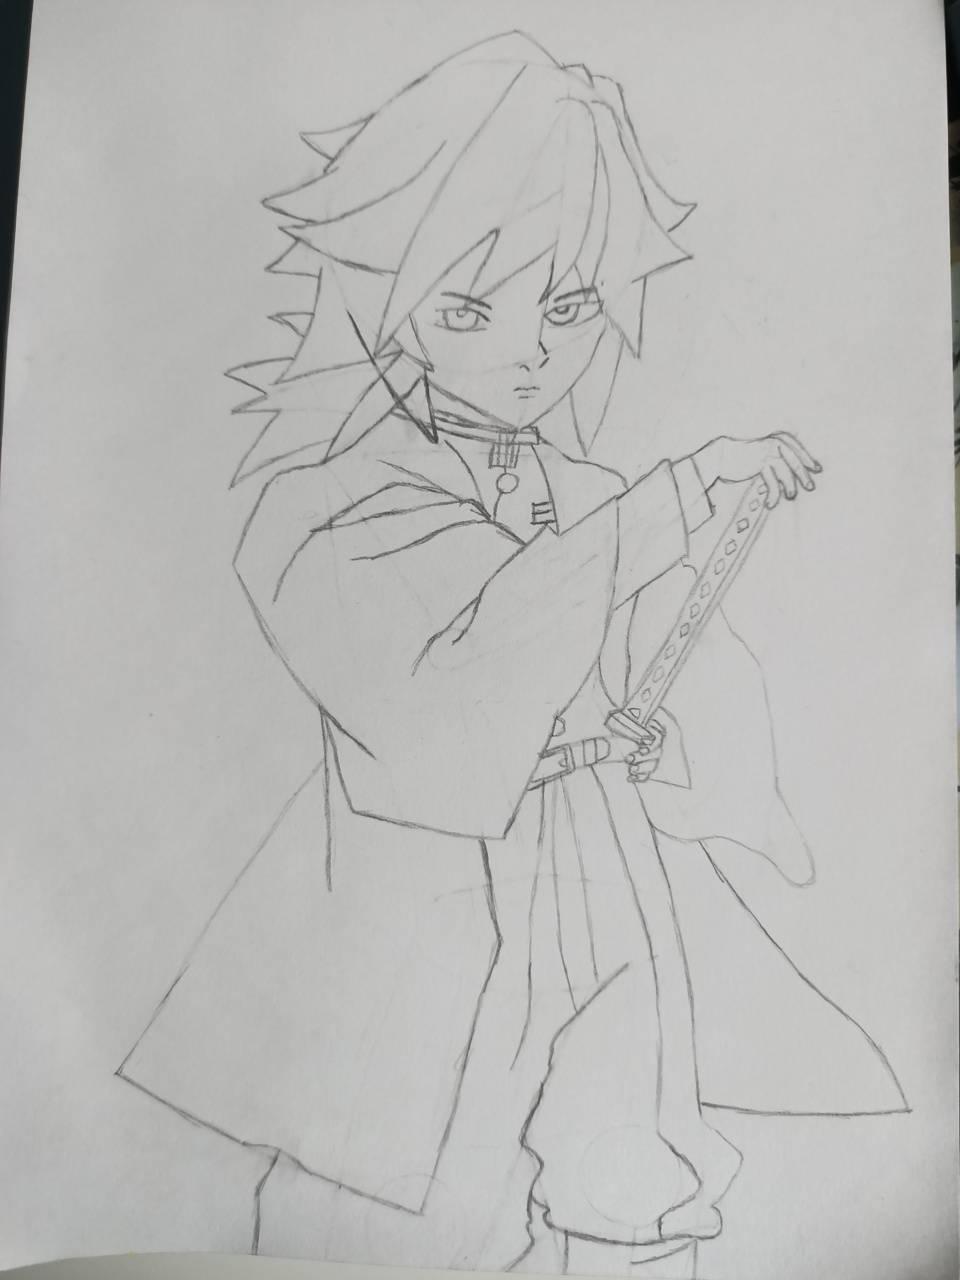 Tomioka sketch